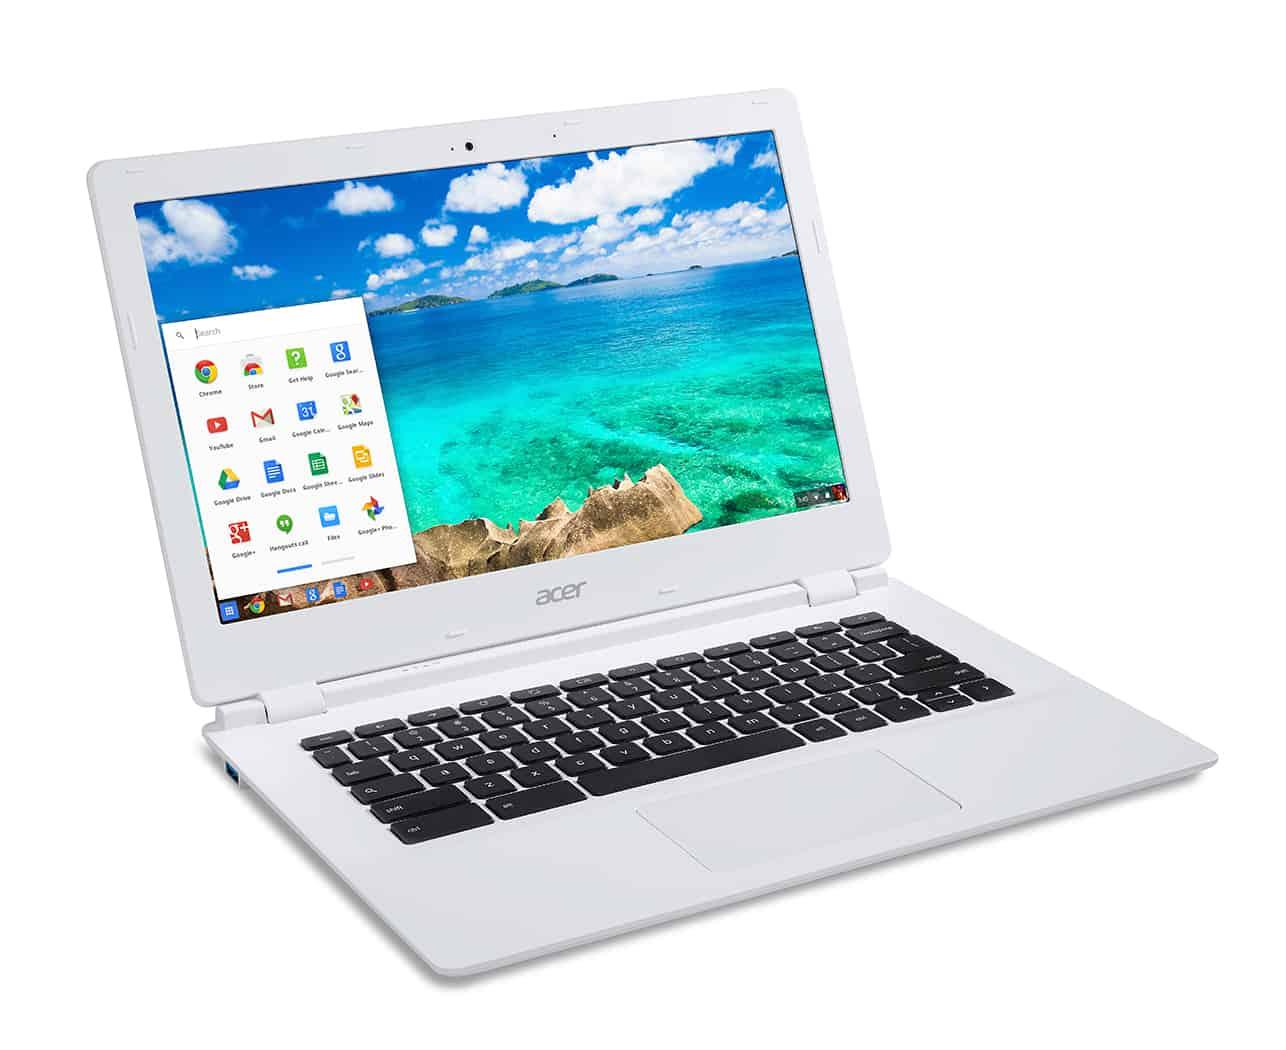 Acer Chromebook 13 CB5 311 AcerWP app 02